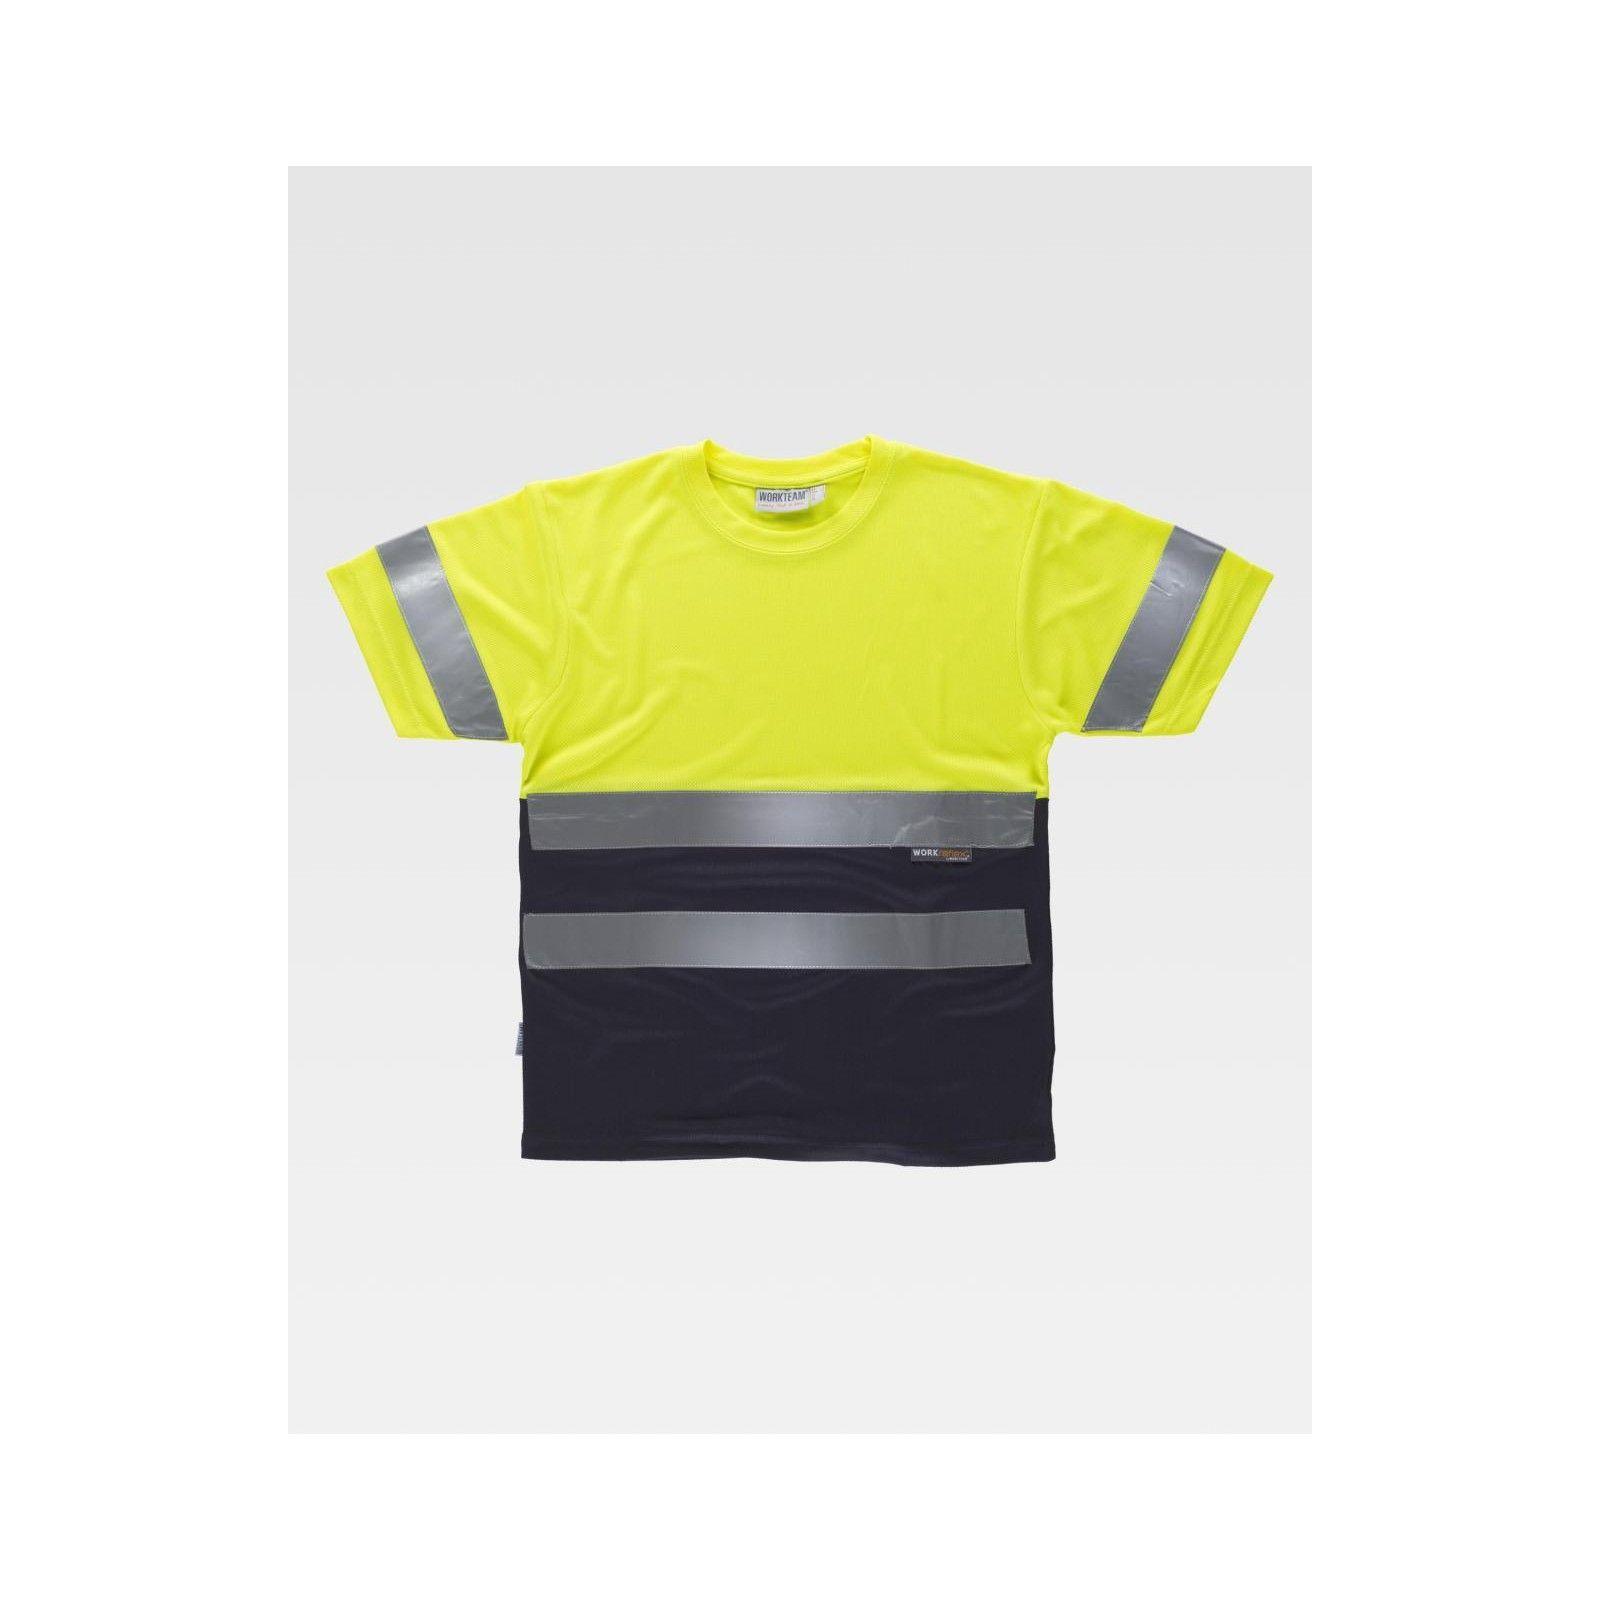 T-shirt combinata alta visibilità